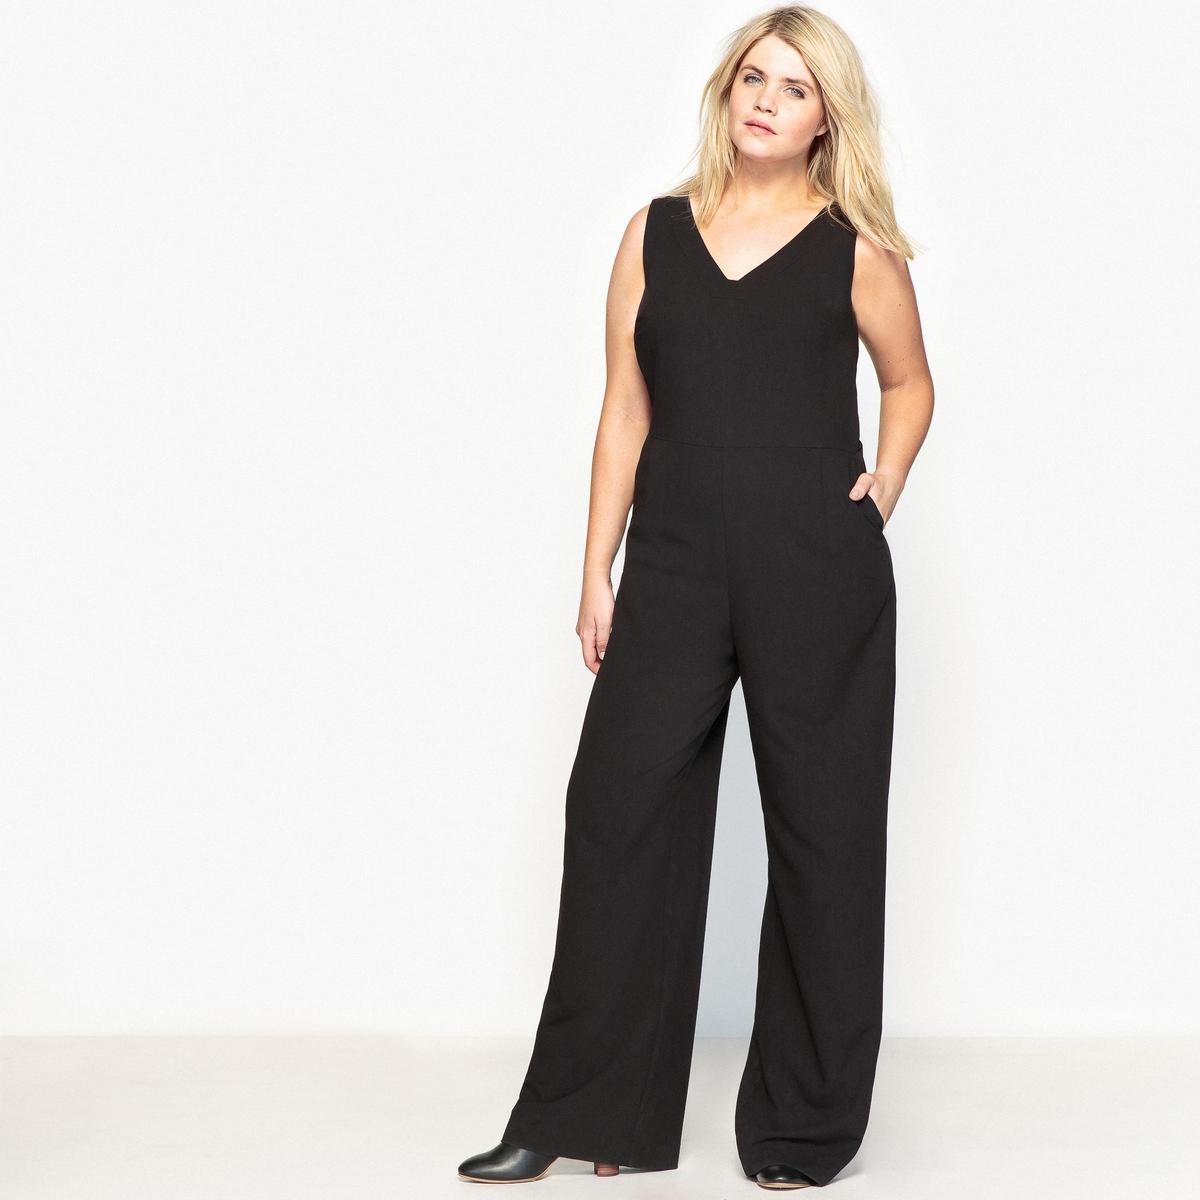 Комбинезон с широкими брюками без рукавов